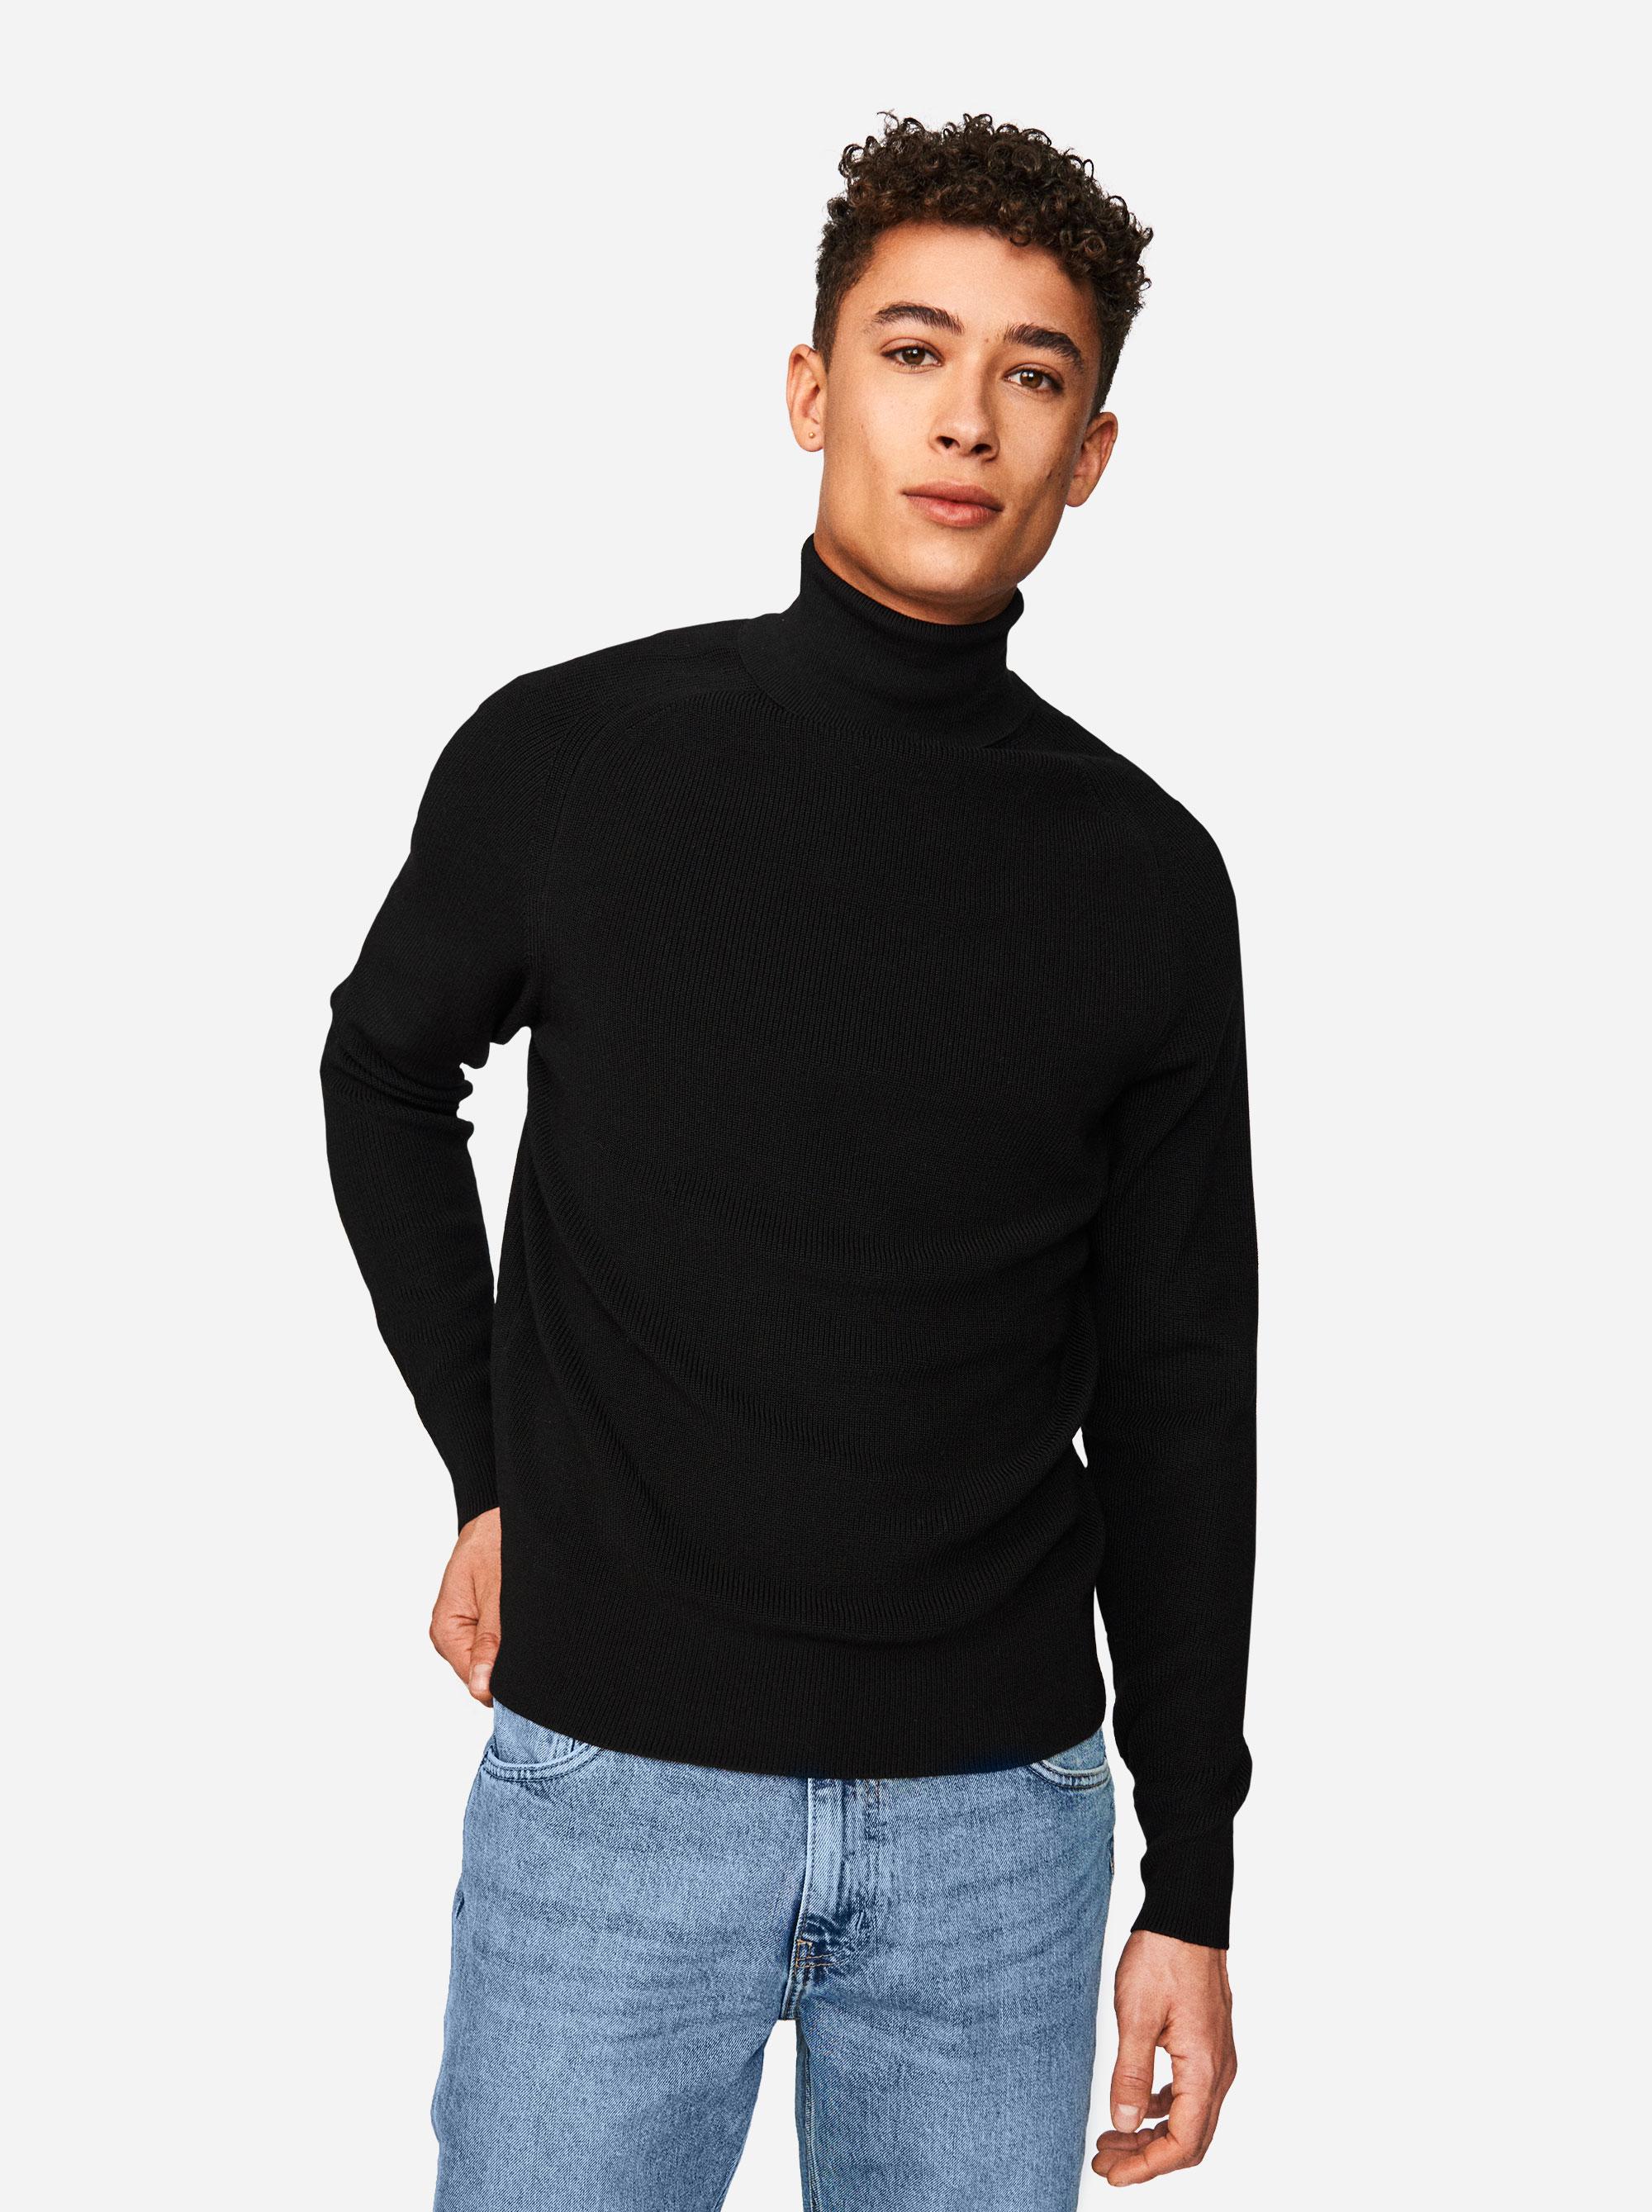 Teym - Turtleneck - The Merino Sweater - Men - Black - 3